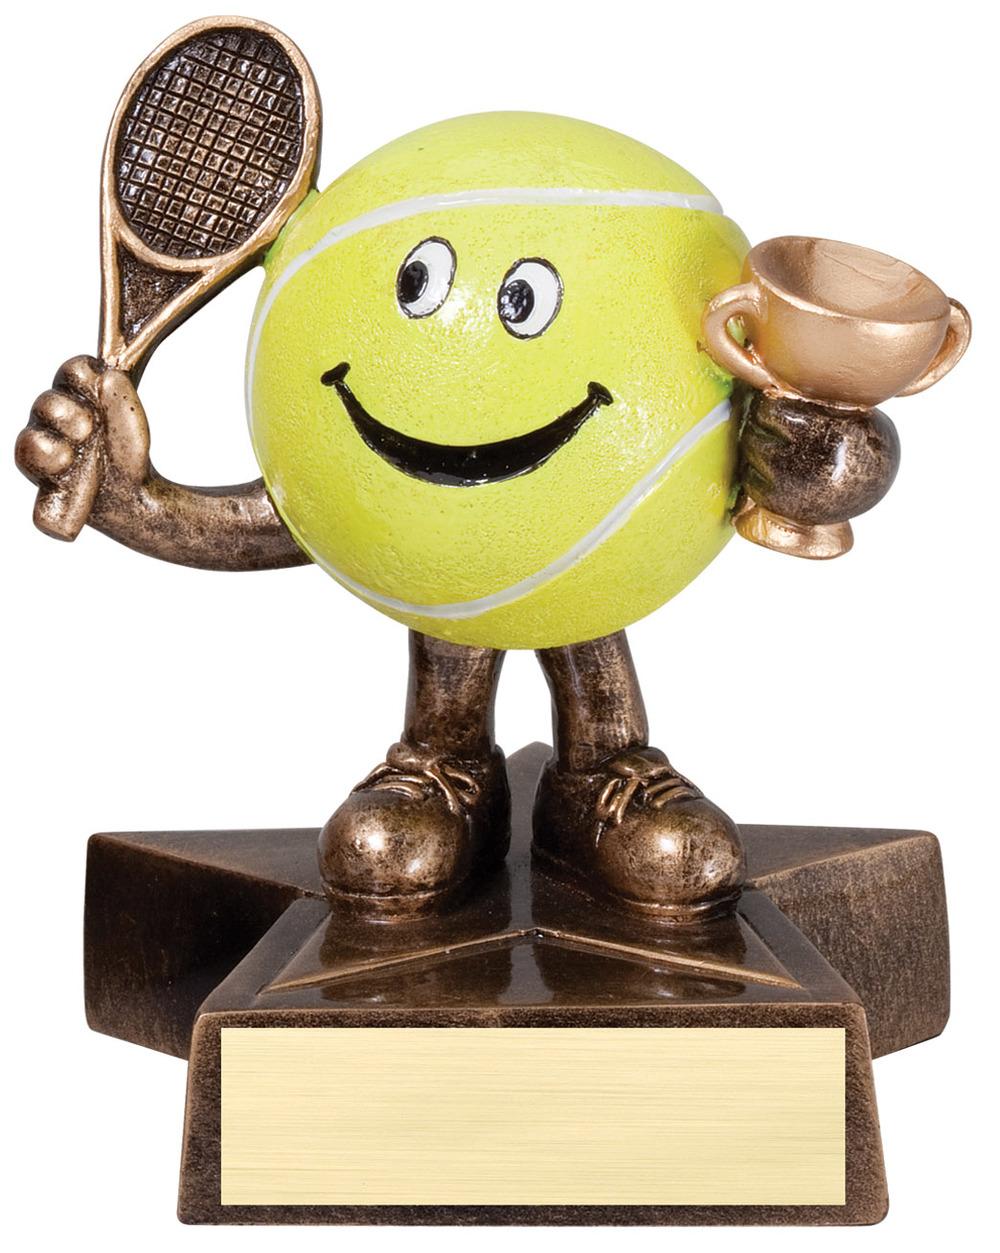 Tennis - LBR15